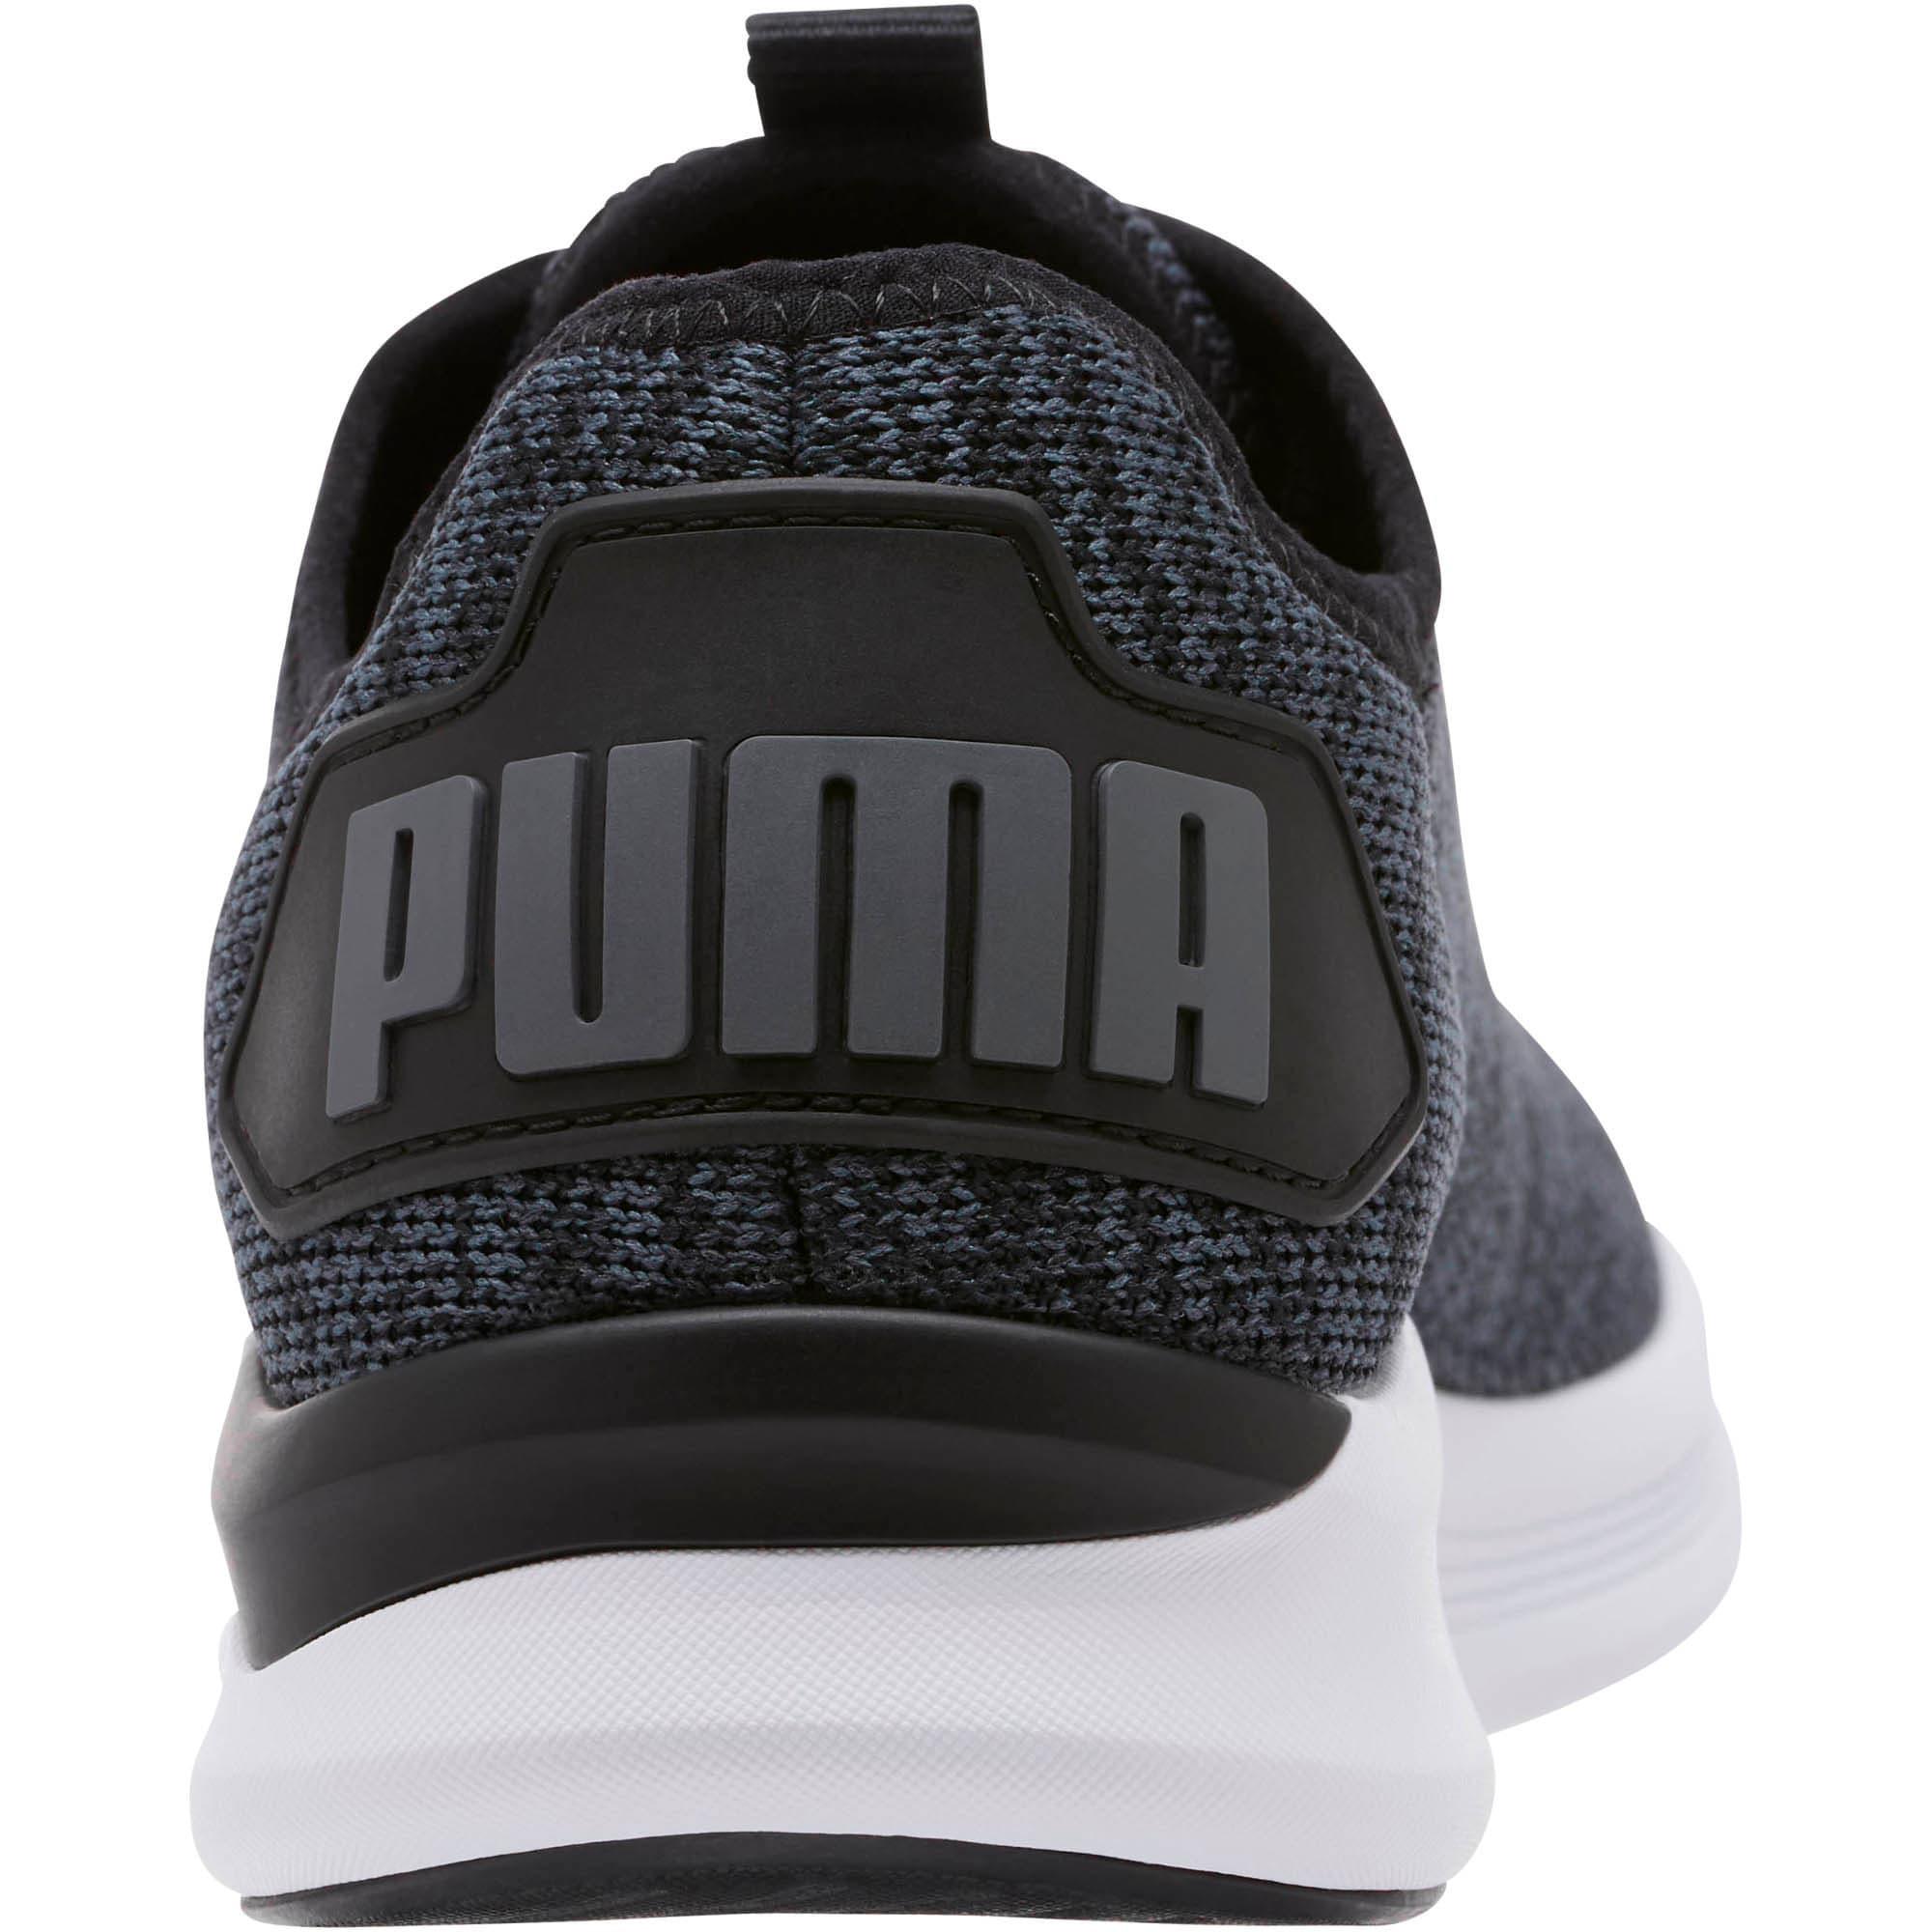 Thumbnail 3 of Ballast Women's Running Shoes, Puma Black-Iron Gate, medium